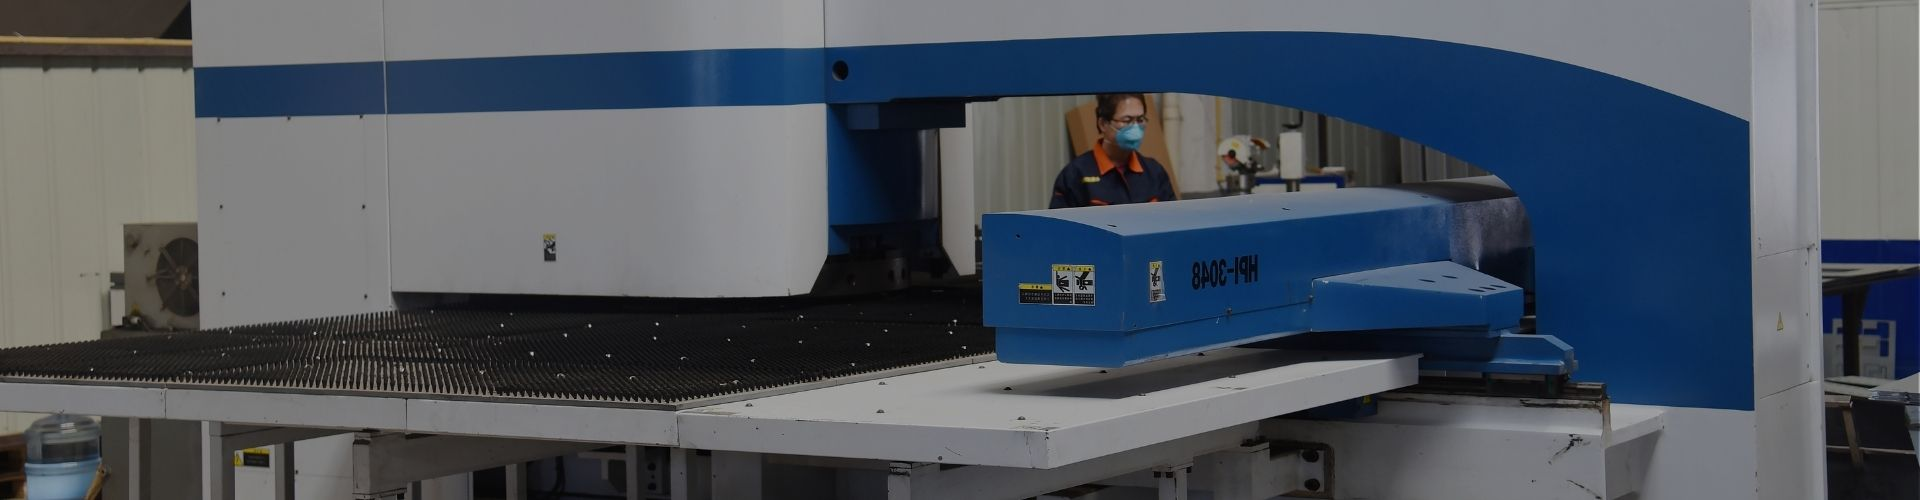 custom electrical enclosure laser cutting